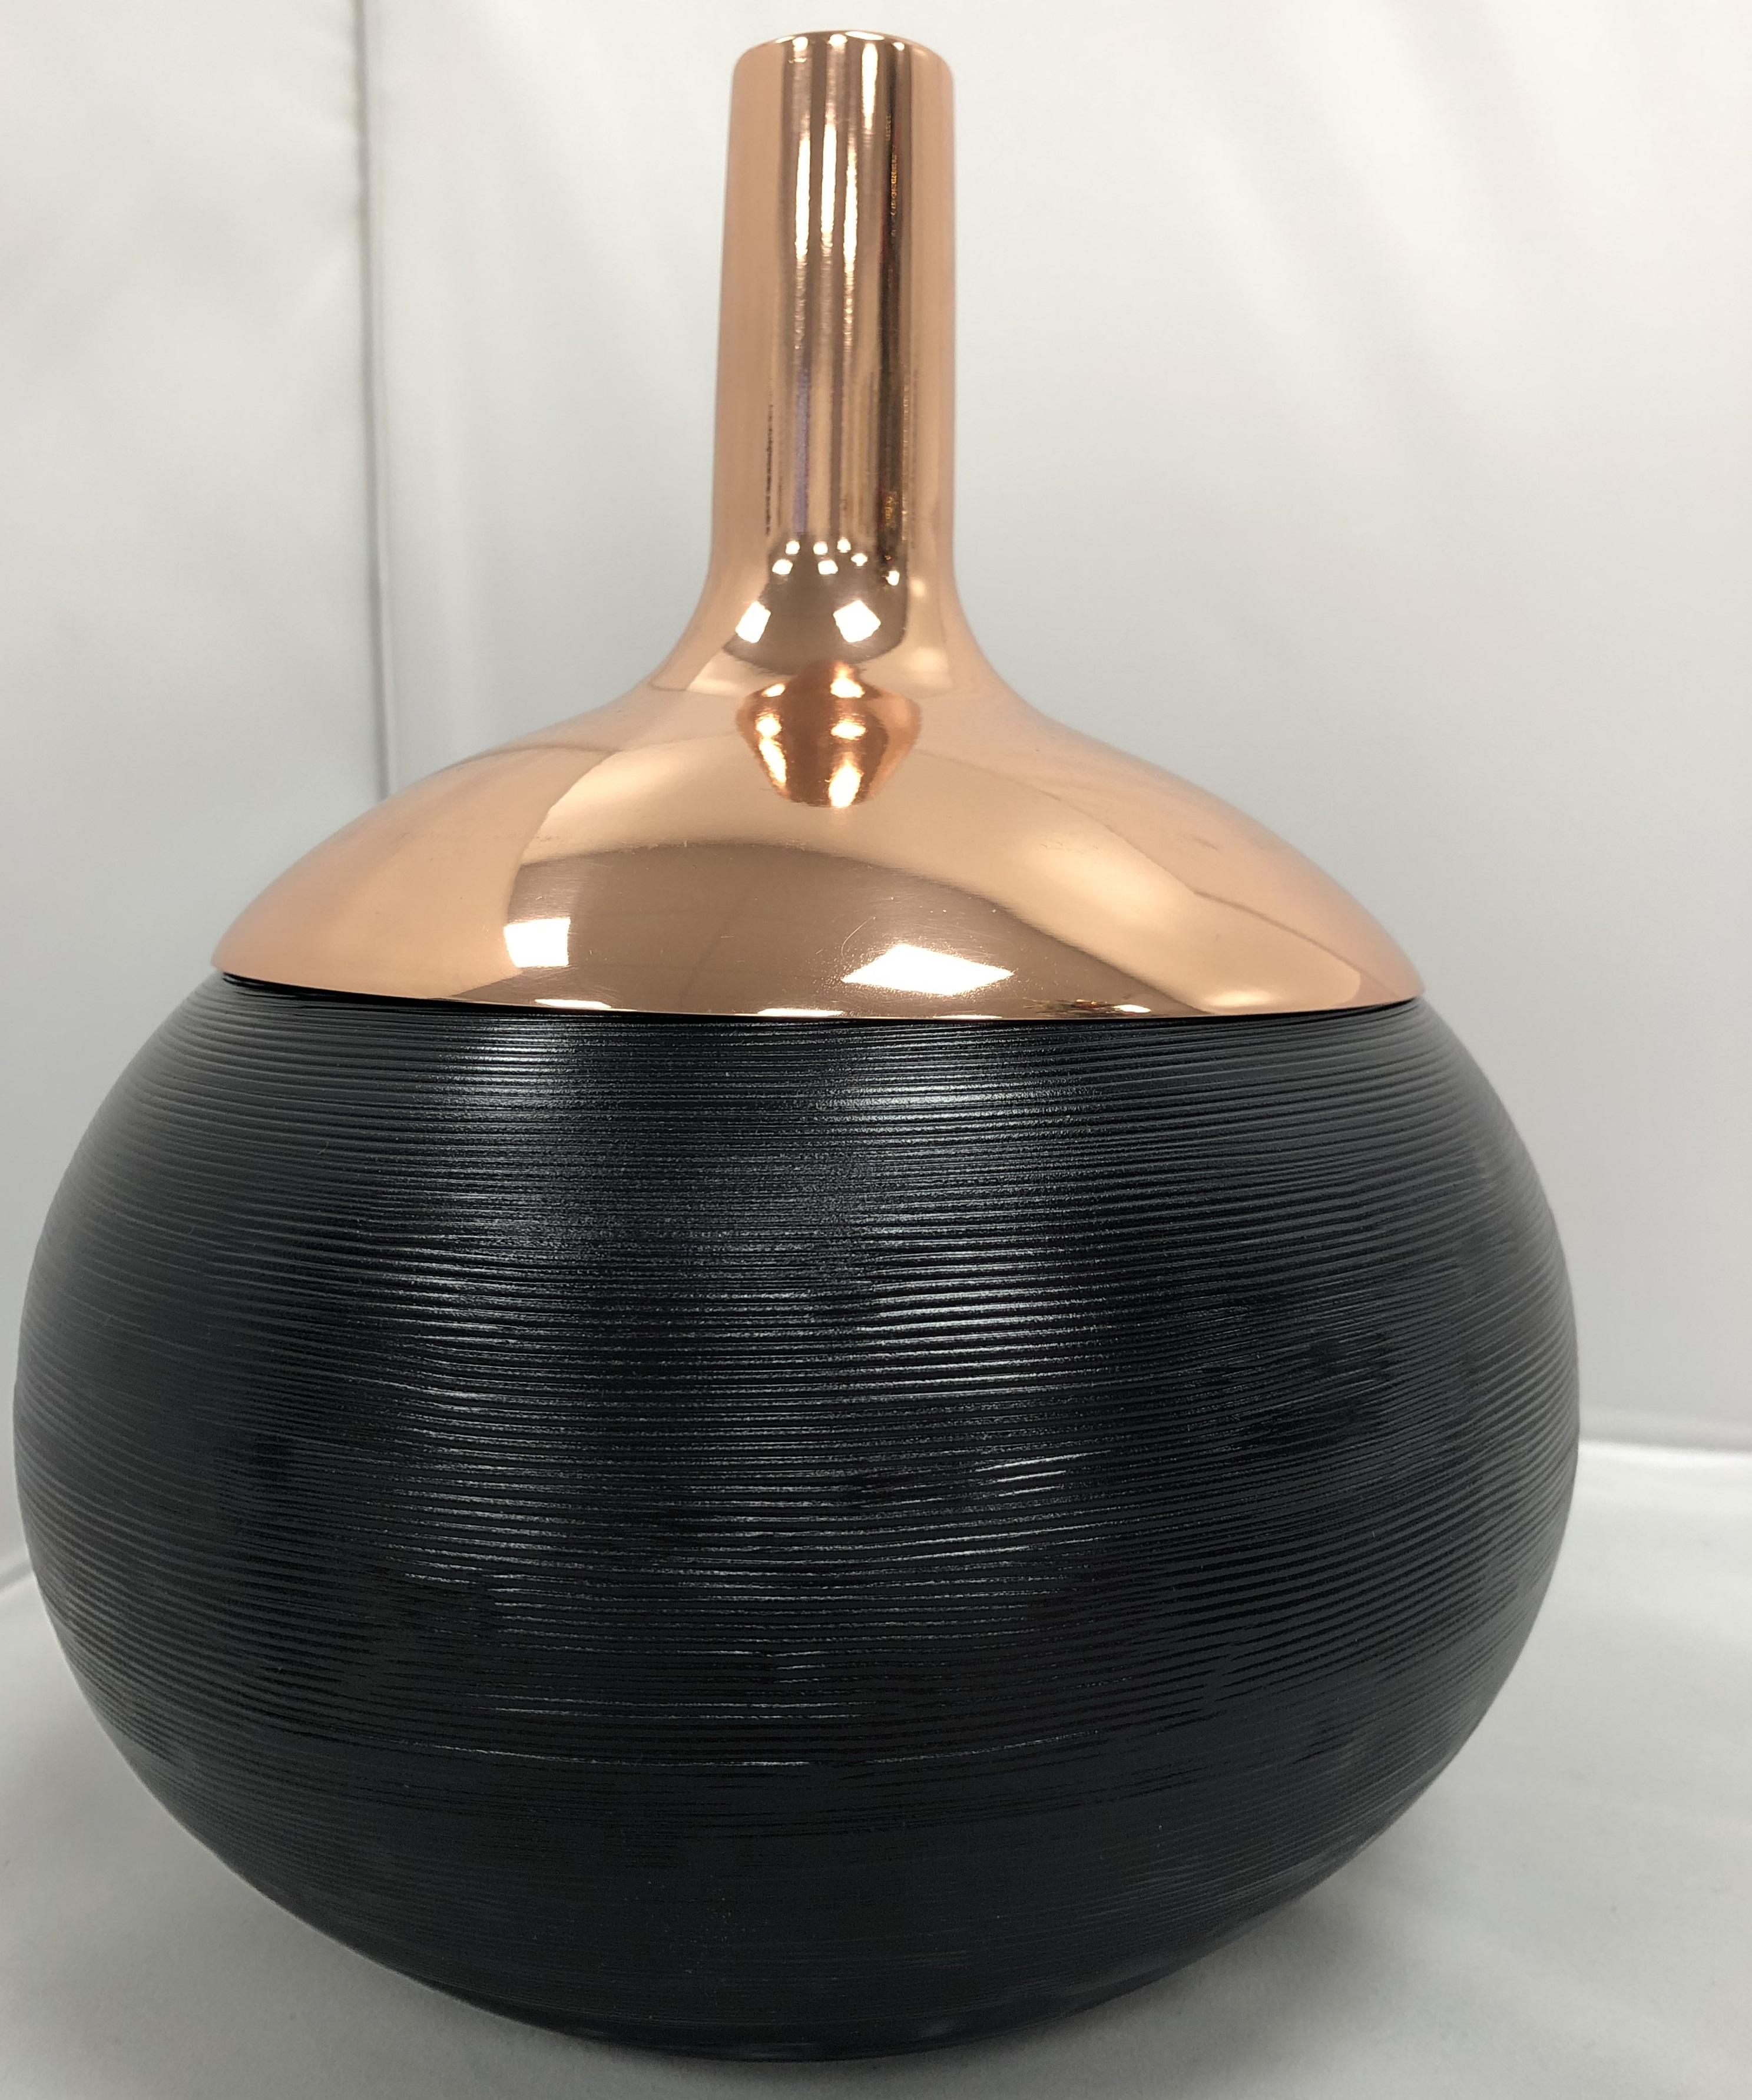 Glass /& Copper B+ Tom Dixon PMIB01 Plum Ice Bucket H36 x W21cm